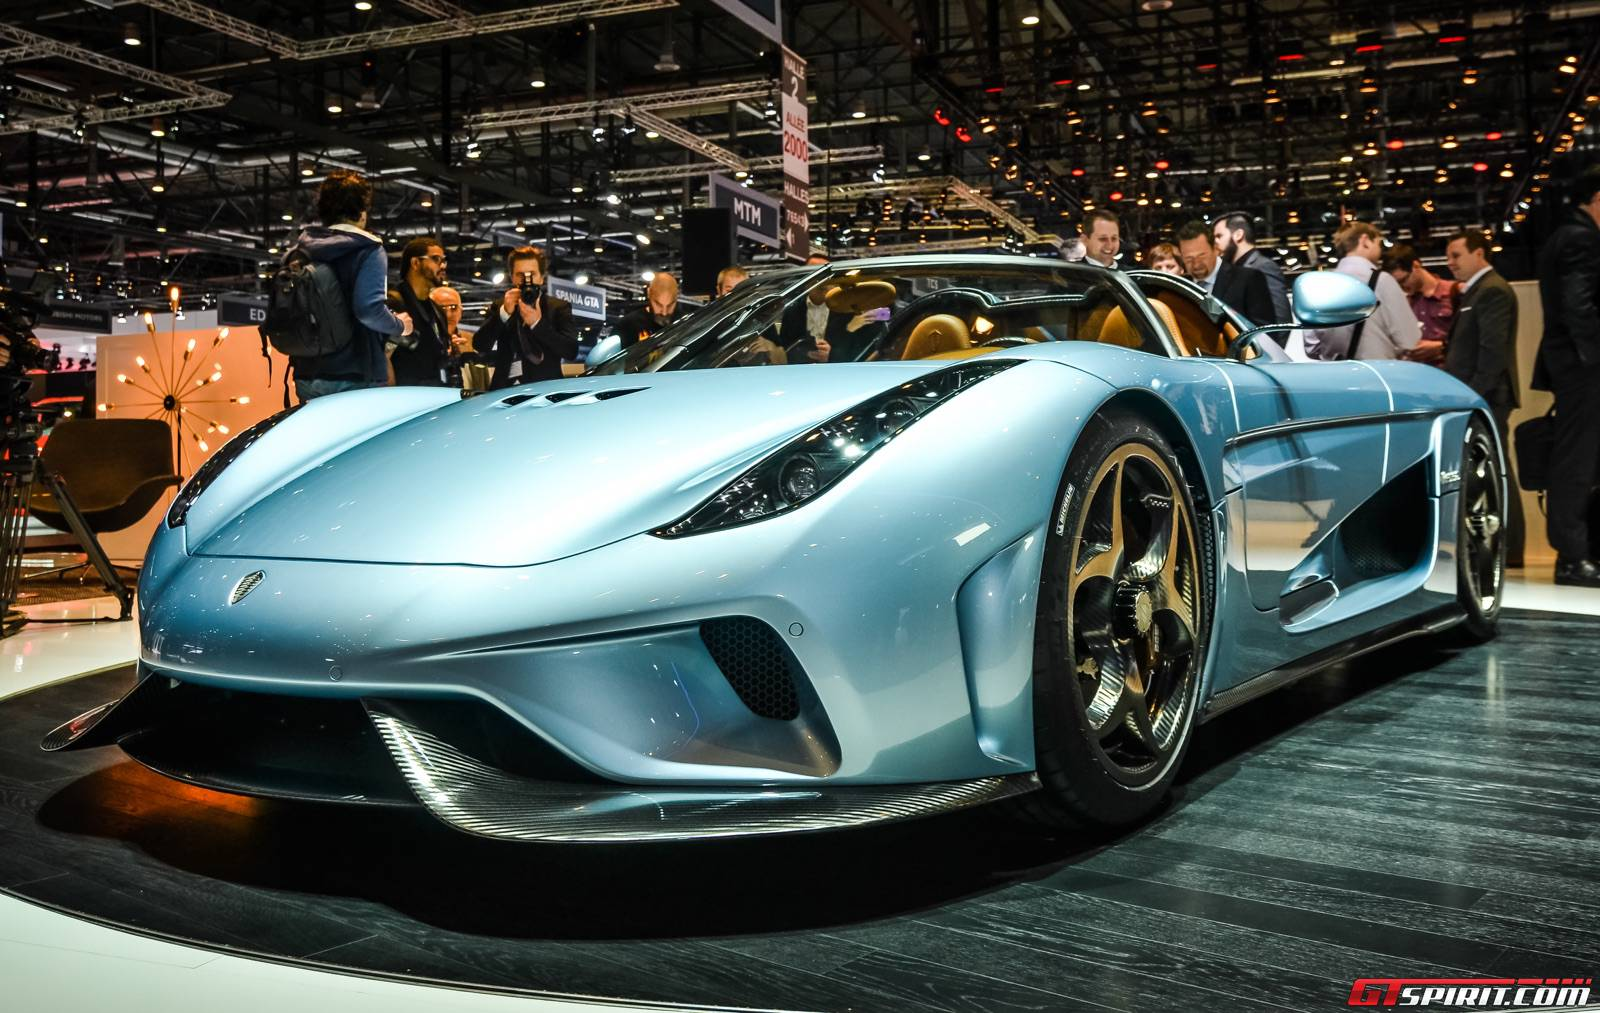 Lamborghini Calgary Named Second North American Koenigsegg